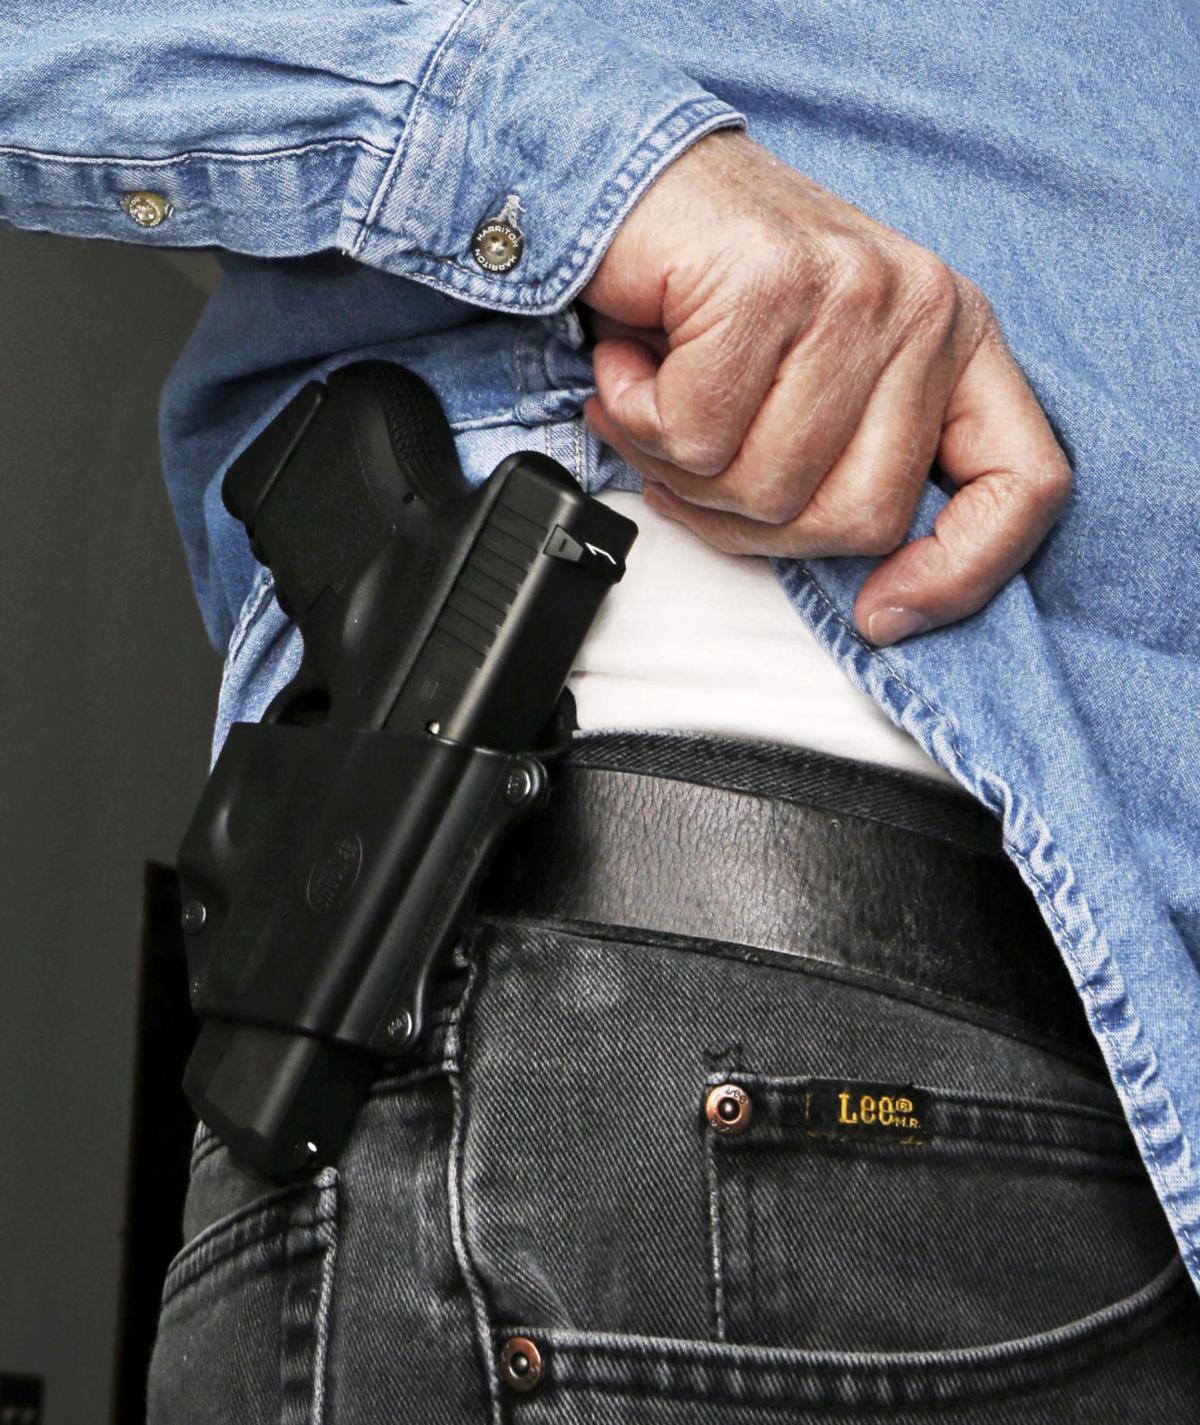 Pistol permits